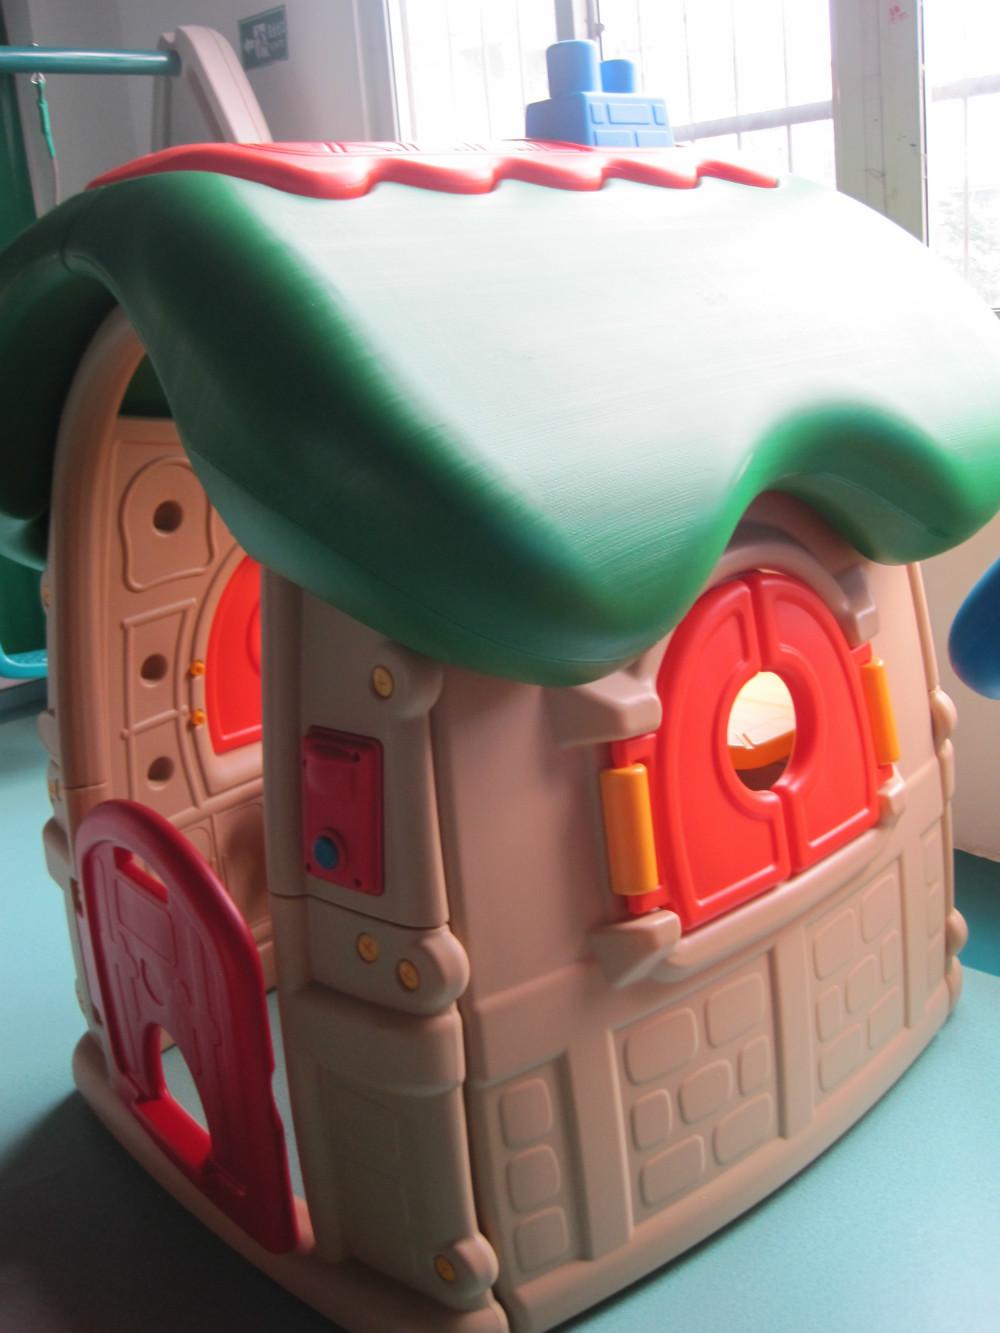 Used Daycare Furniture Sale Kids Plastic Outdoor Playhouse Buy Plastic Outdoor Playhouse Kids